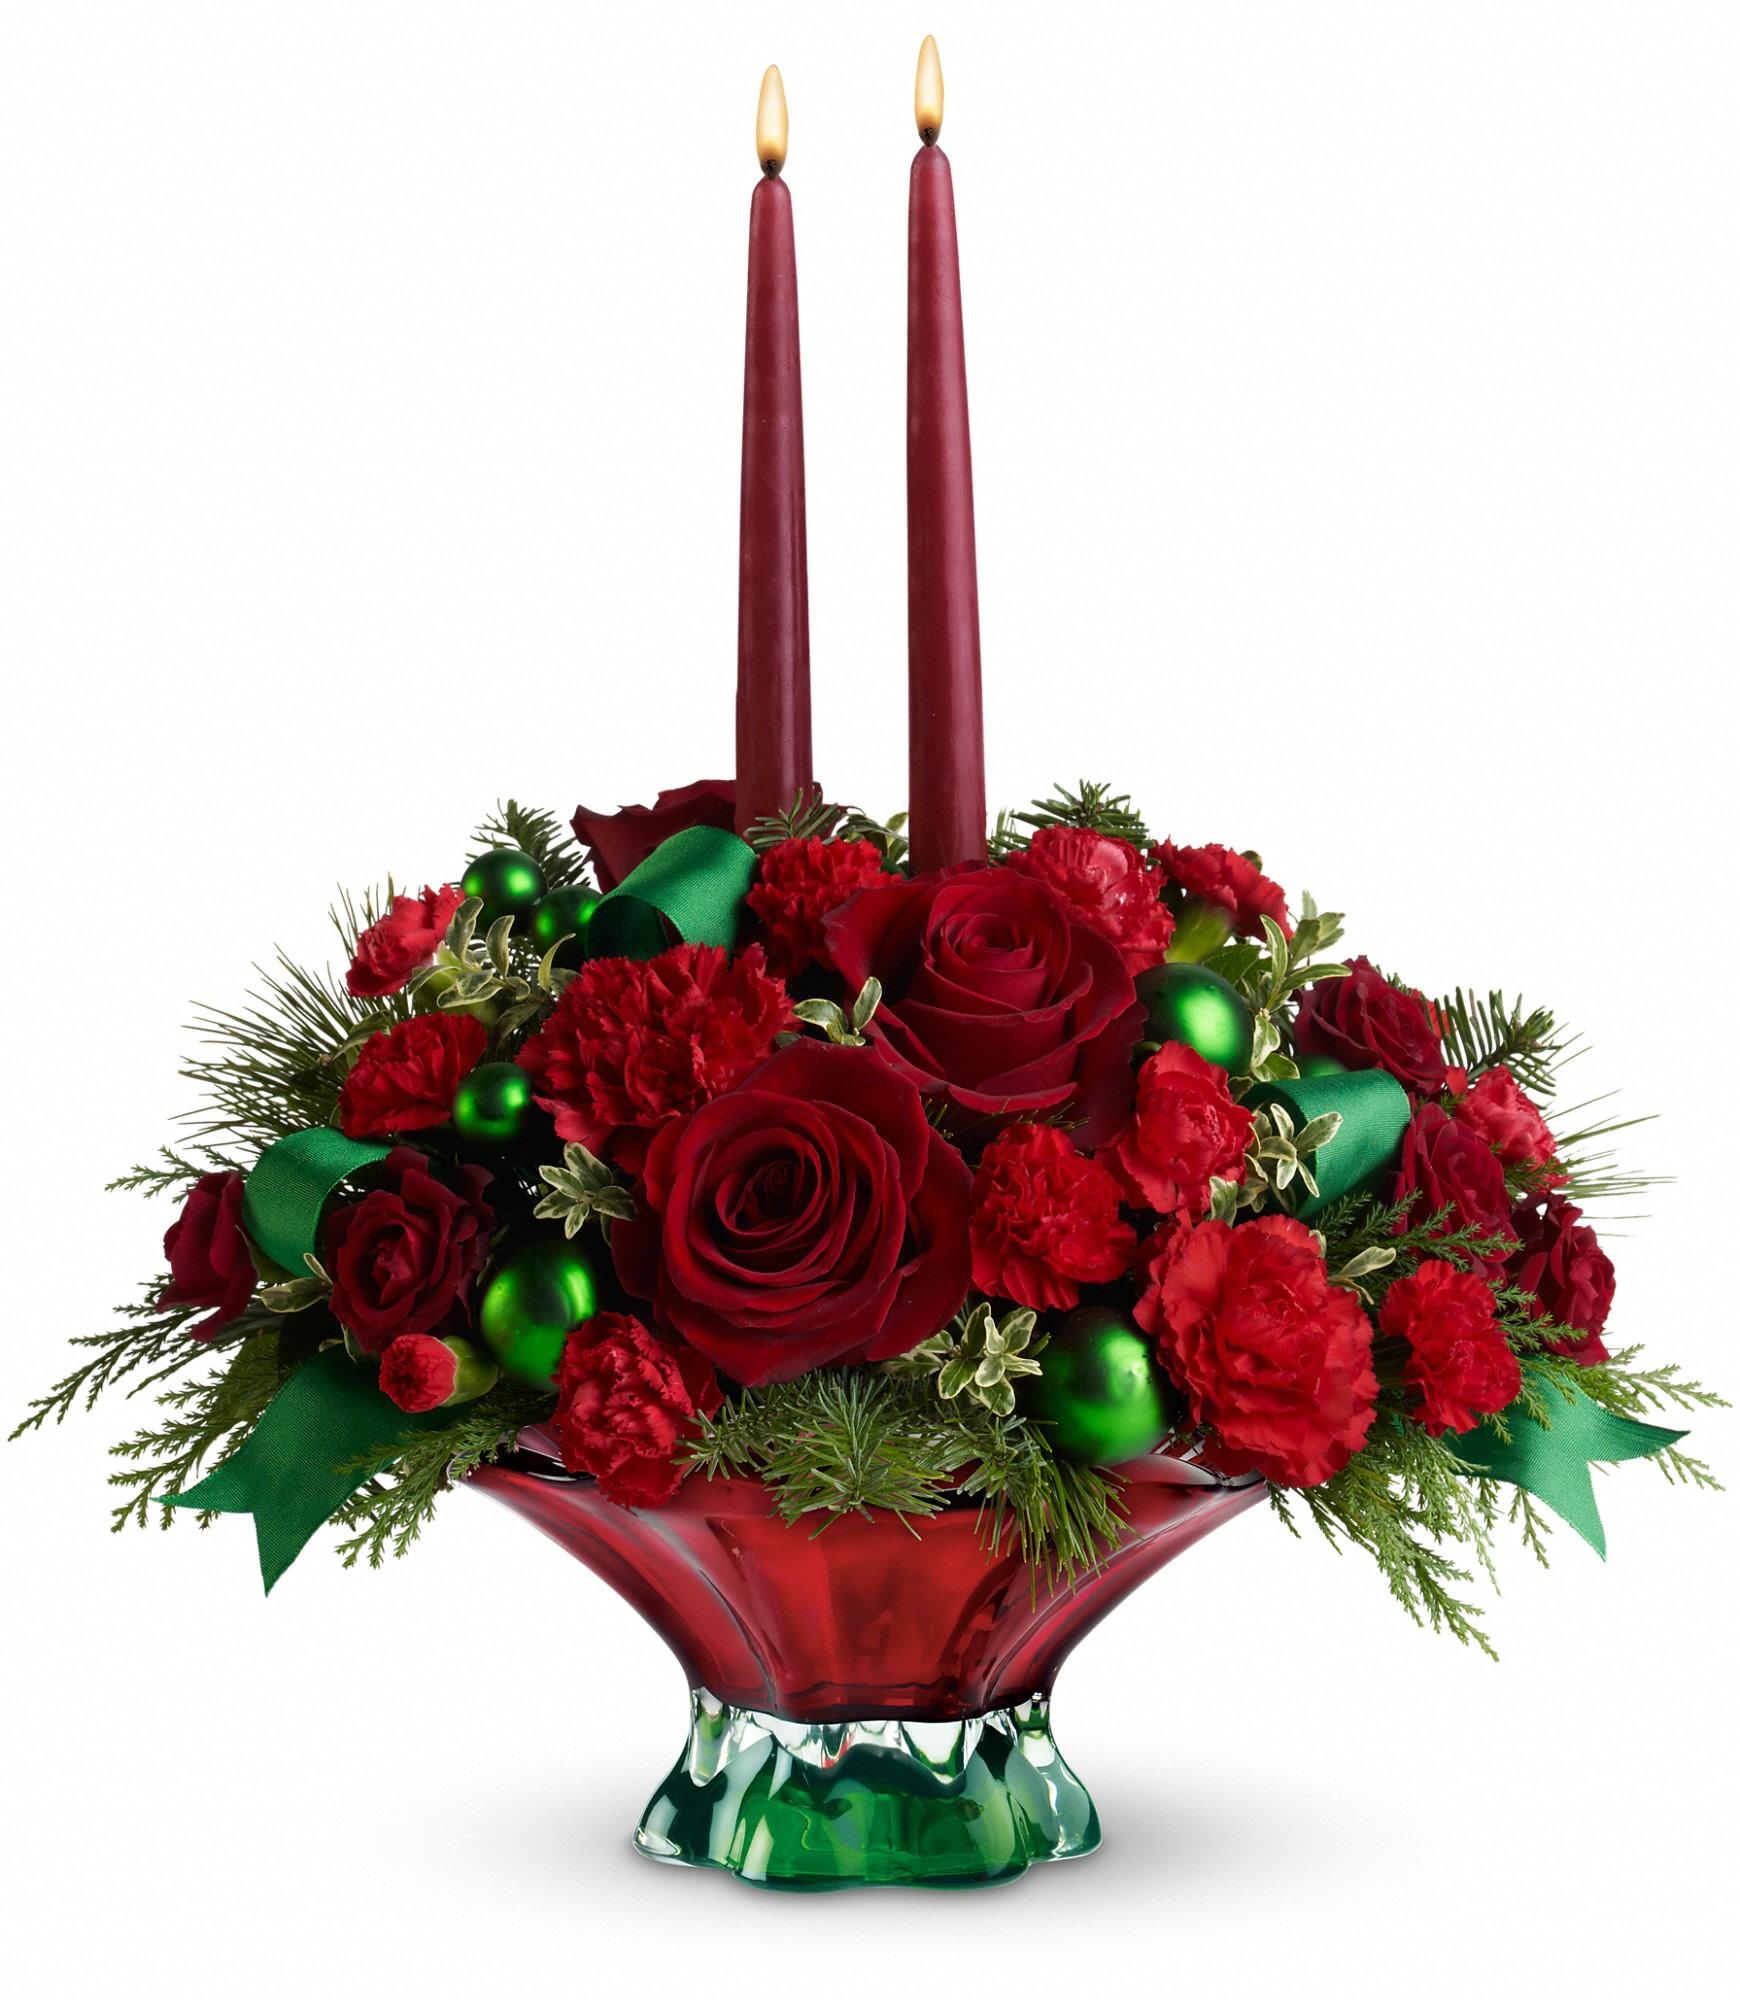 Teleflora Christmas 2019.Teleflora S Joyful Christmas Centerpiece In San Jacinto Ca San Jacinto Florist